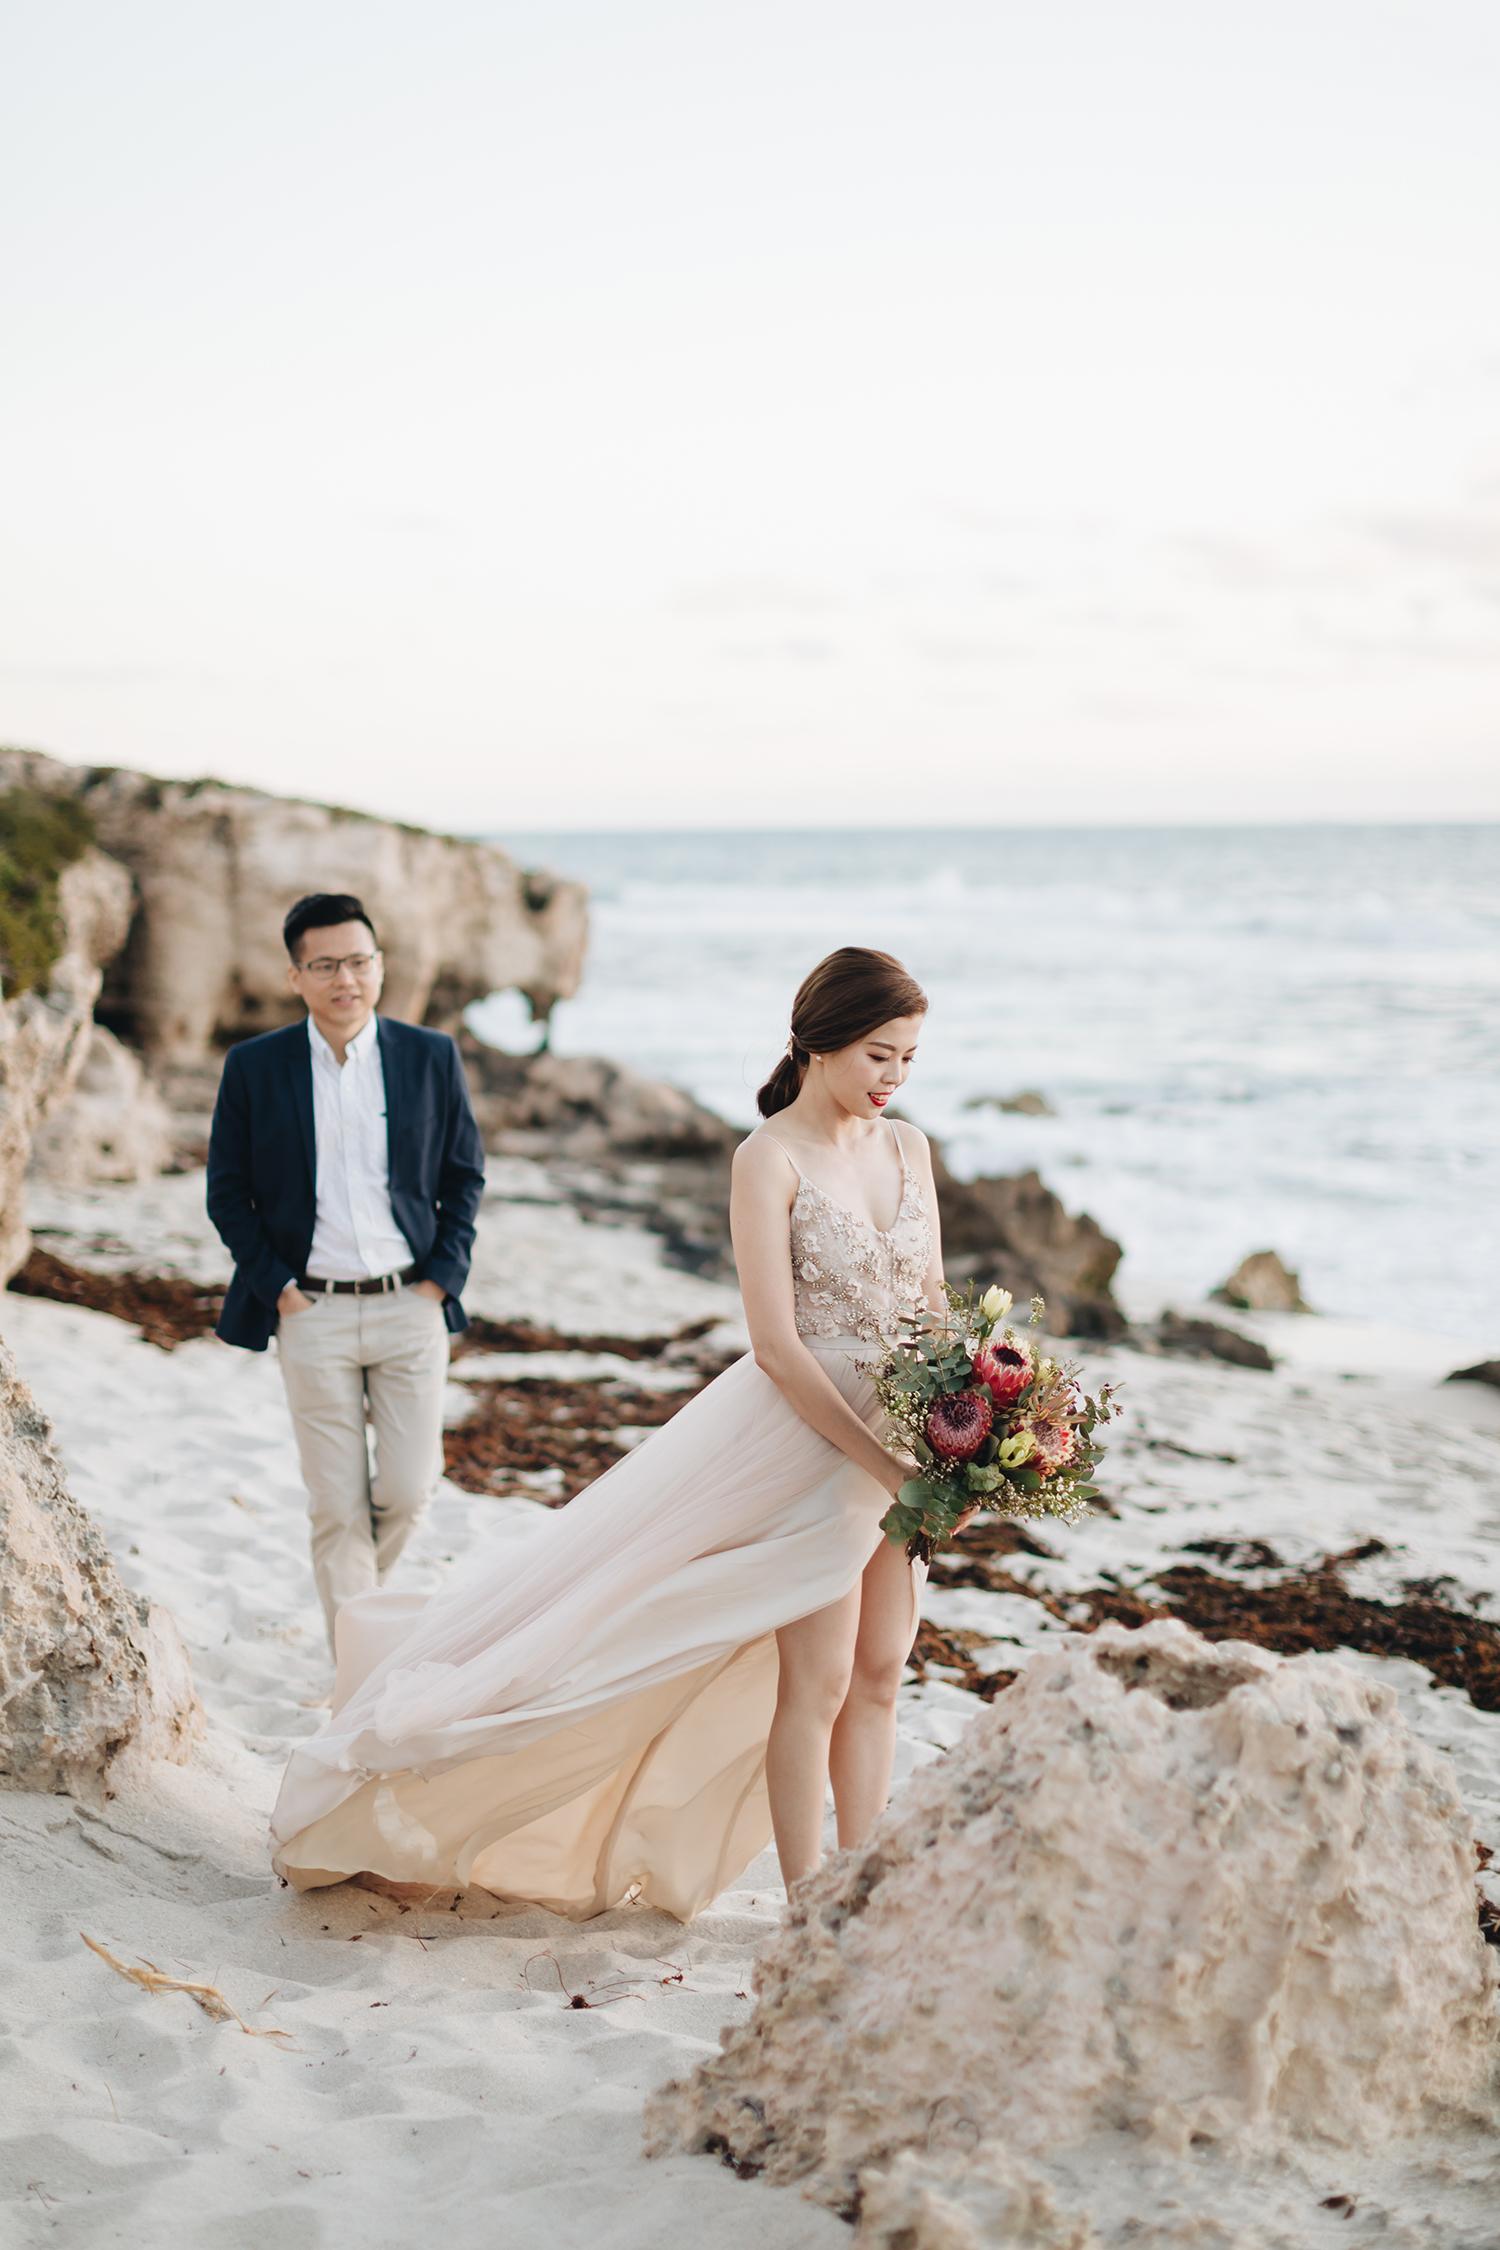 CAMMI + KWEE HOONG - Destination Pre-wedding @ Perth, Australia